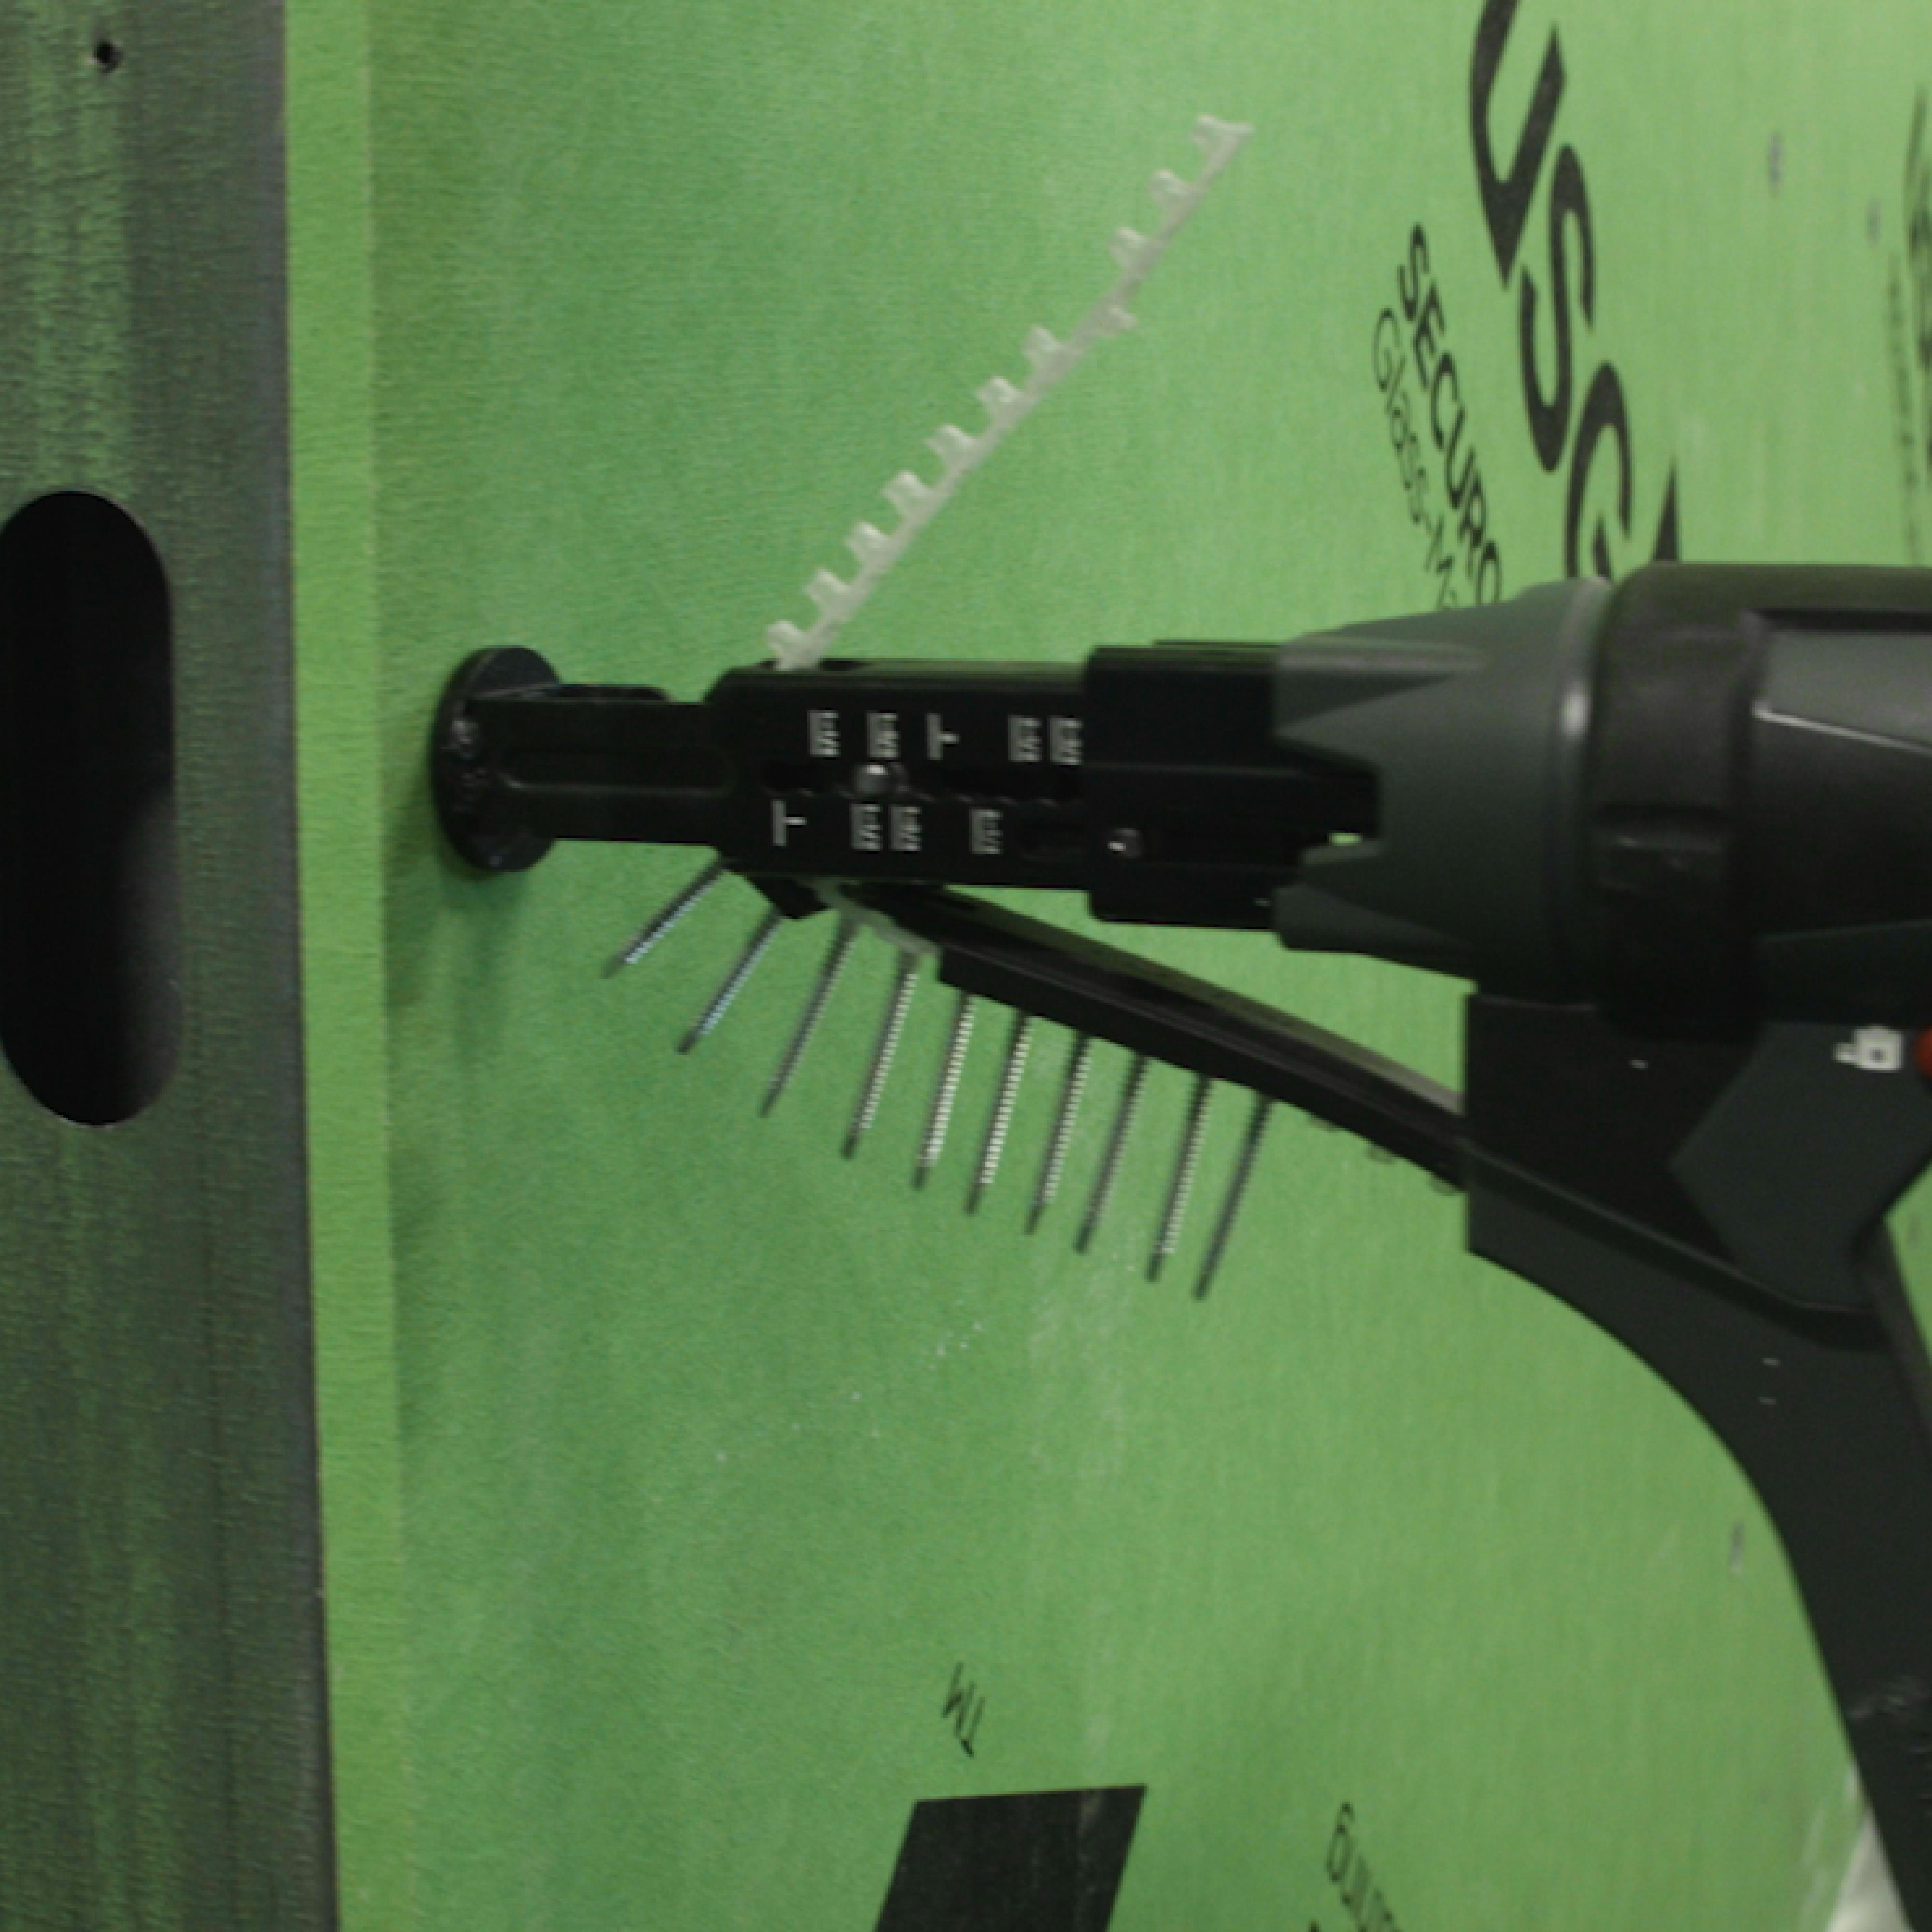 Grip-Lok® Autofeed Fastening System